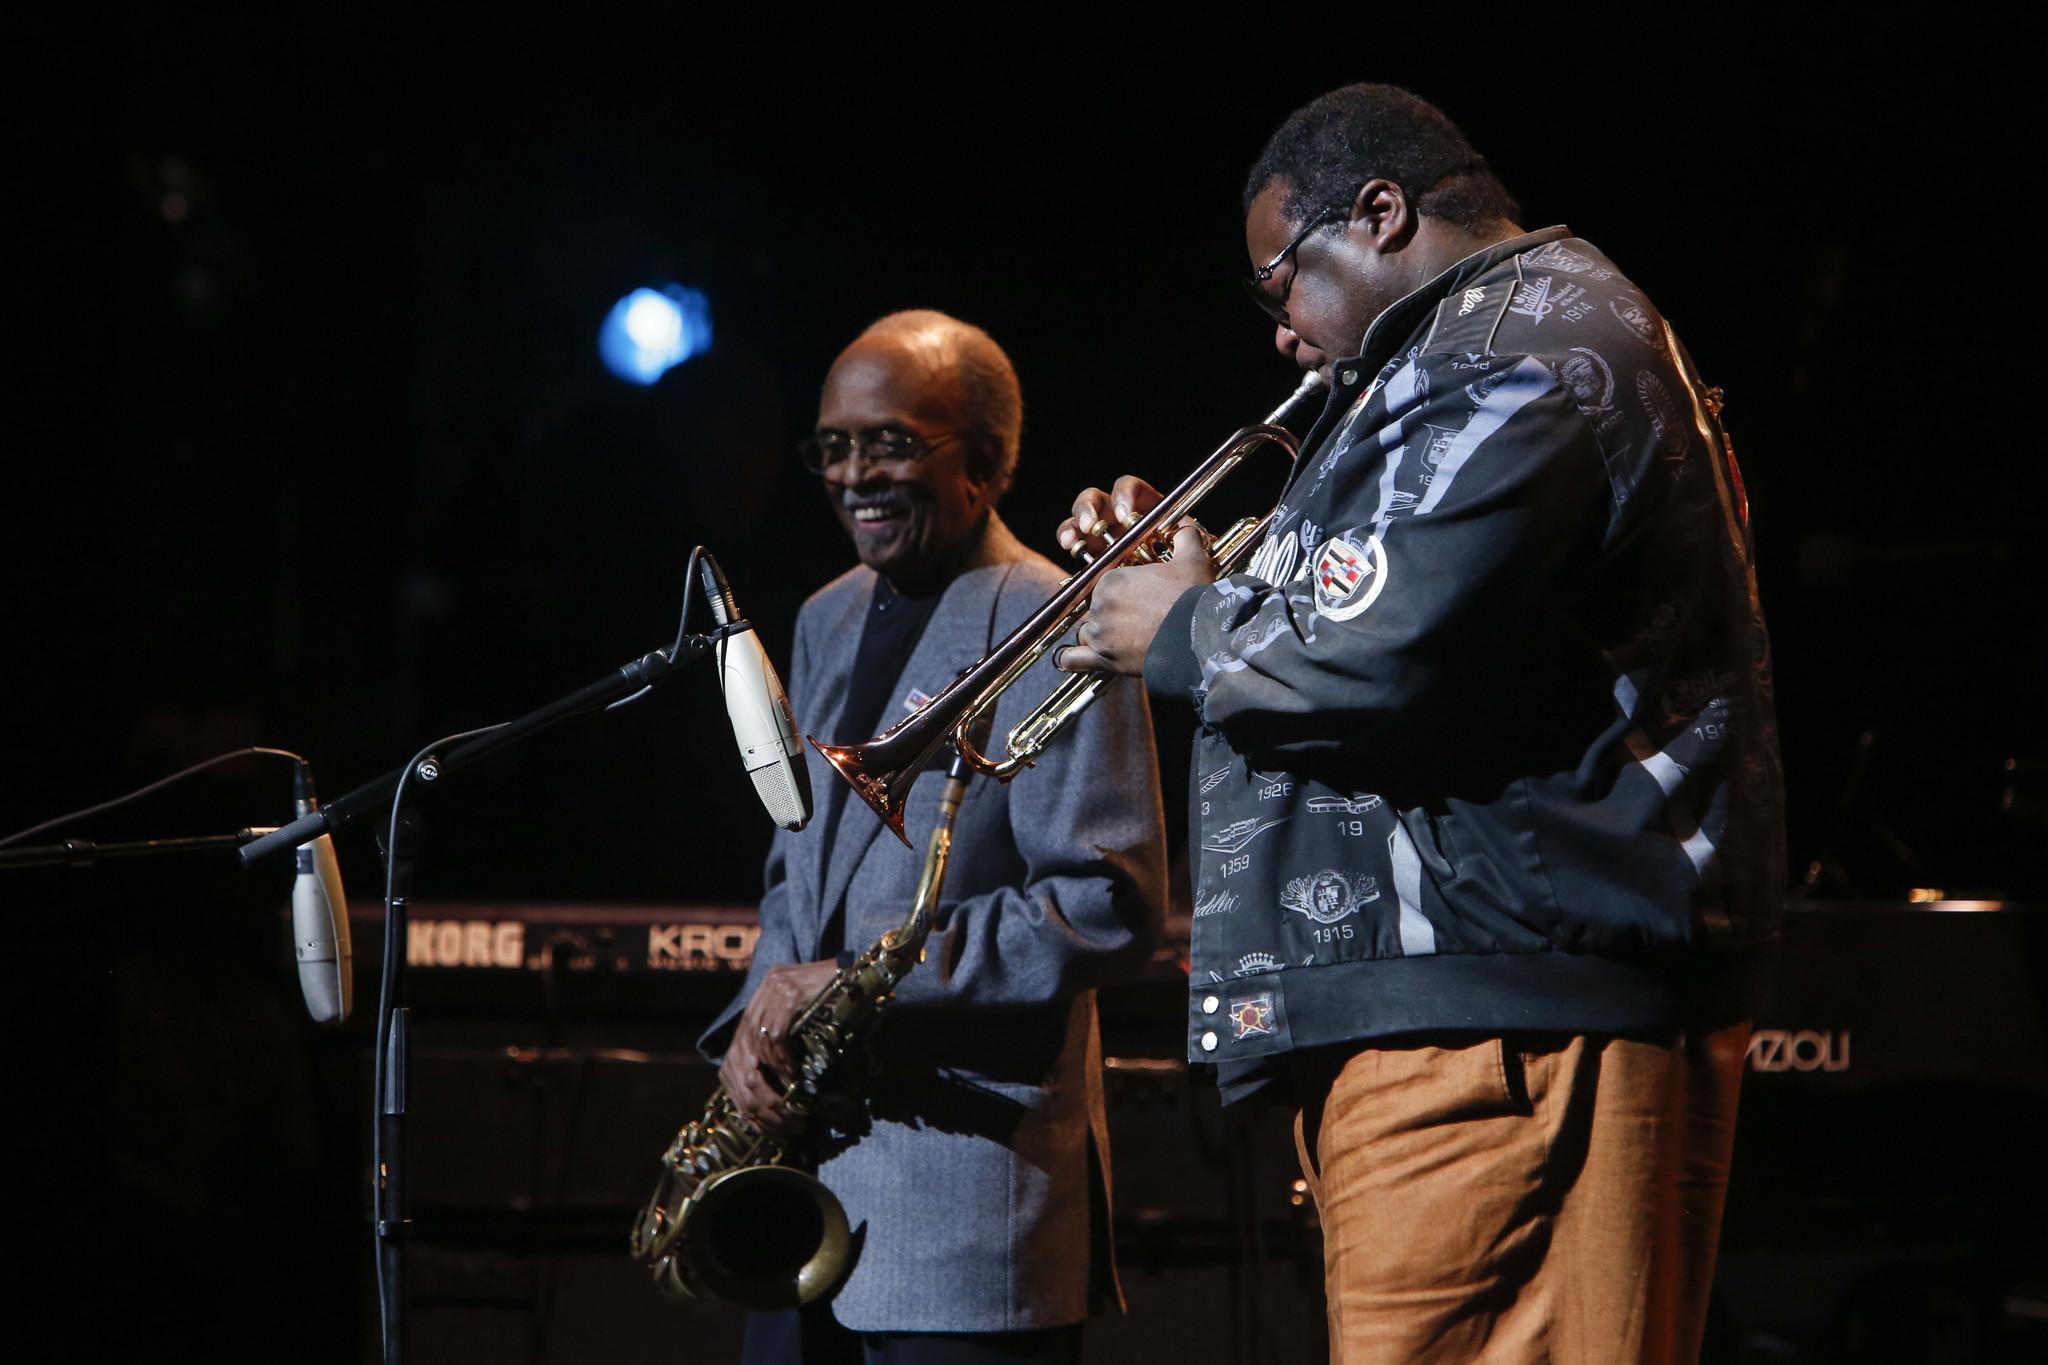 Jazz trumpeter Wallace Roney dies from coronavirus at 59